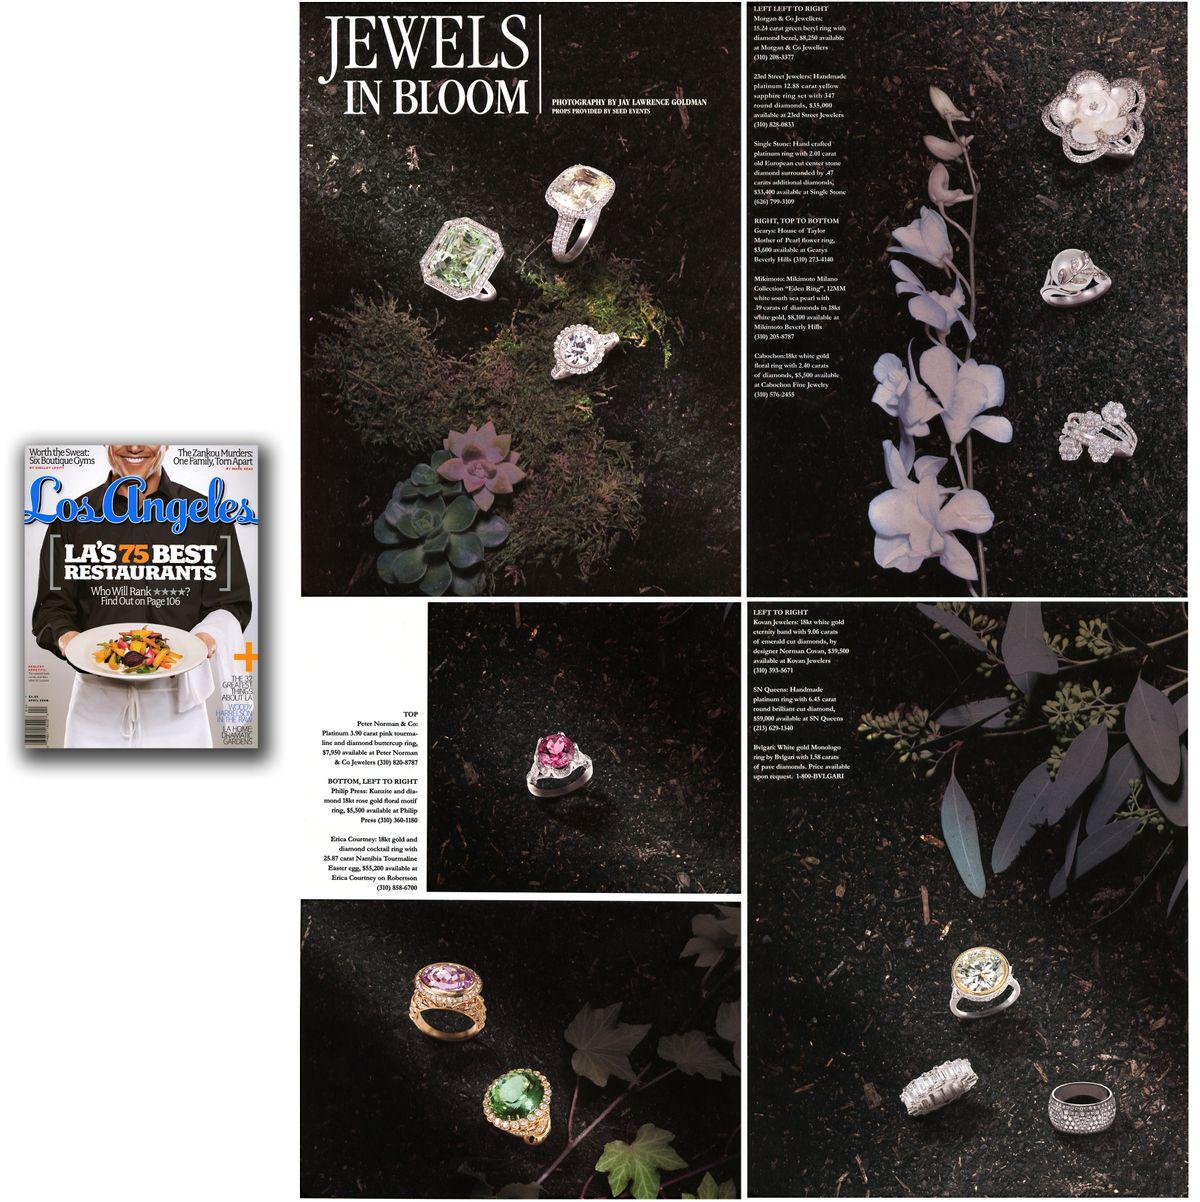 jewels in bloomflat.jpg